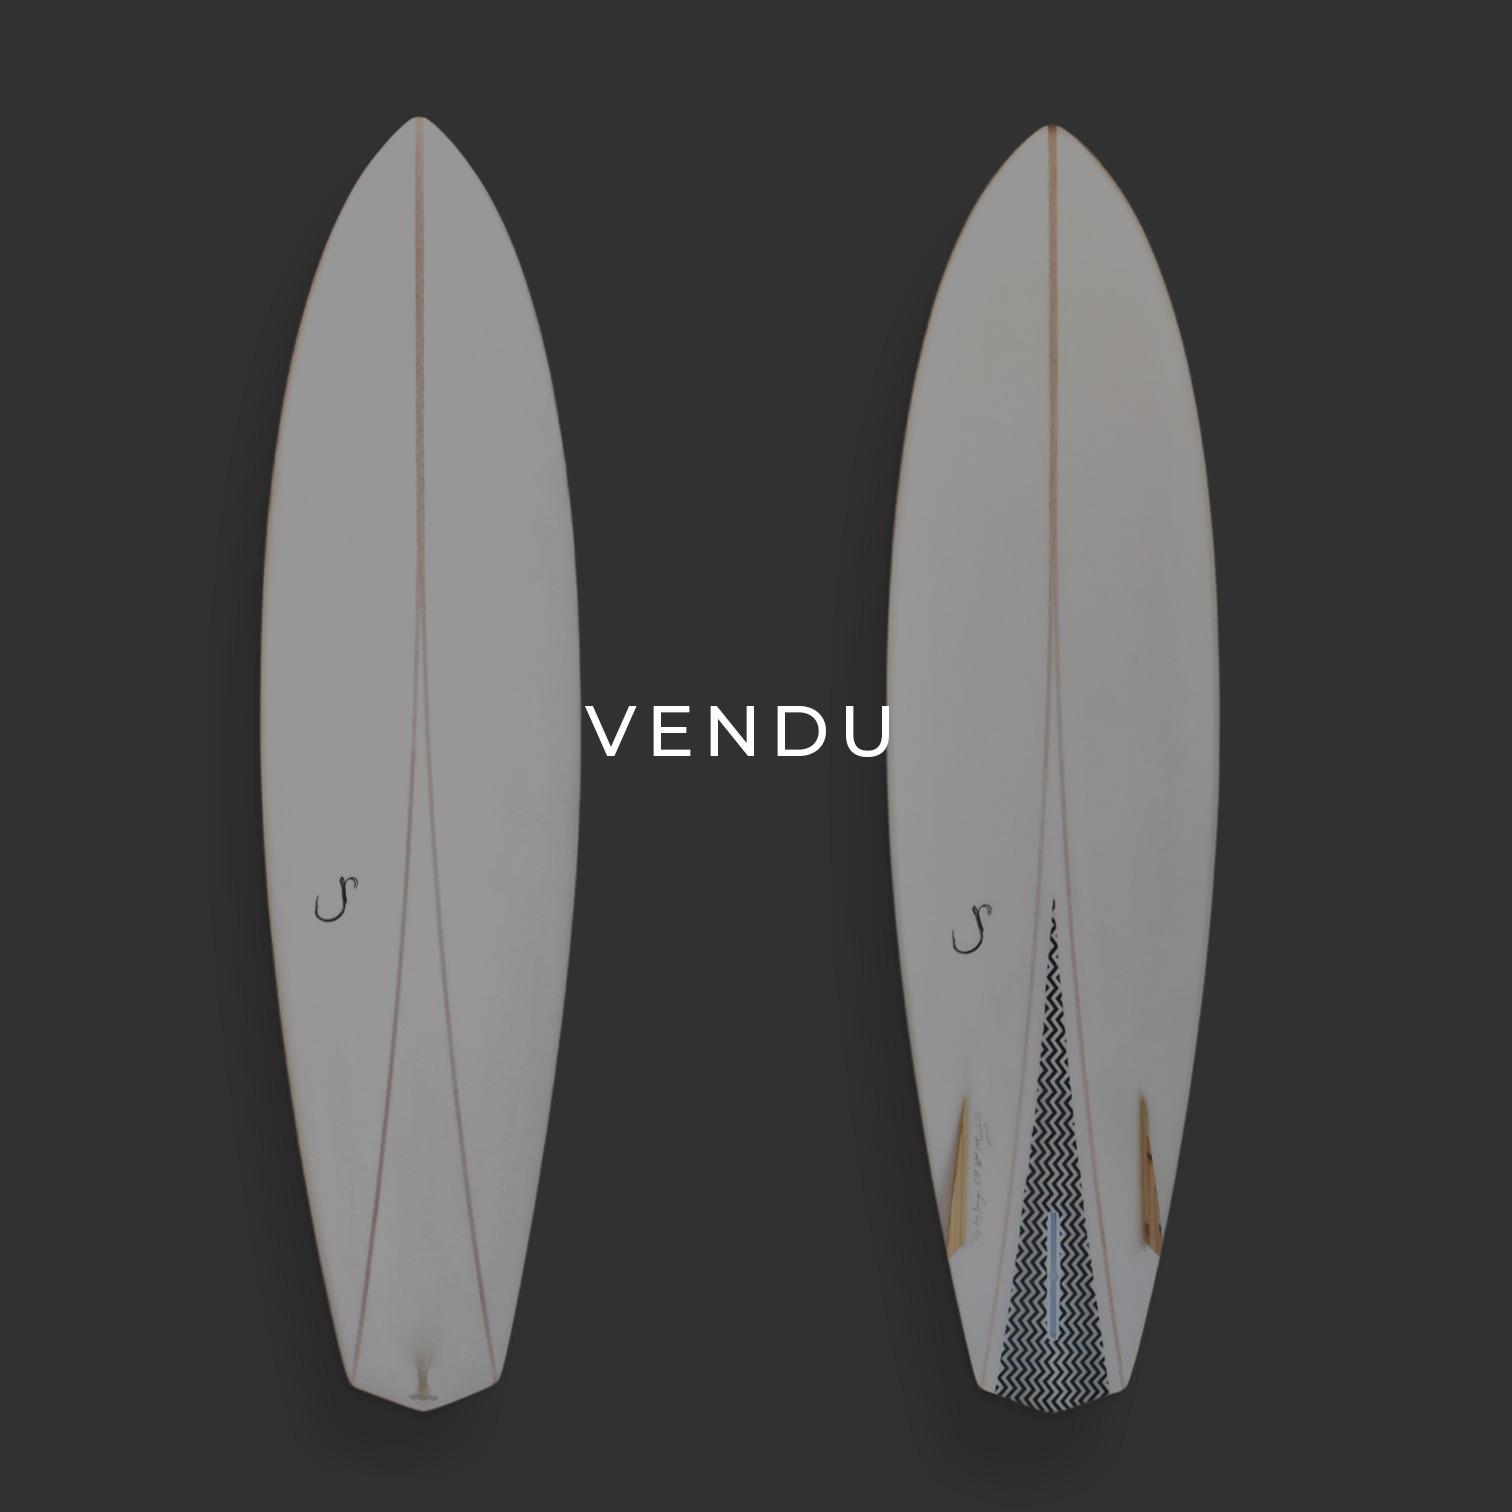 Cachalot Surfboards artisan surf shaper bois hollow wooden bois bonzer zig zag